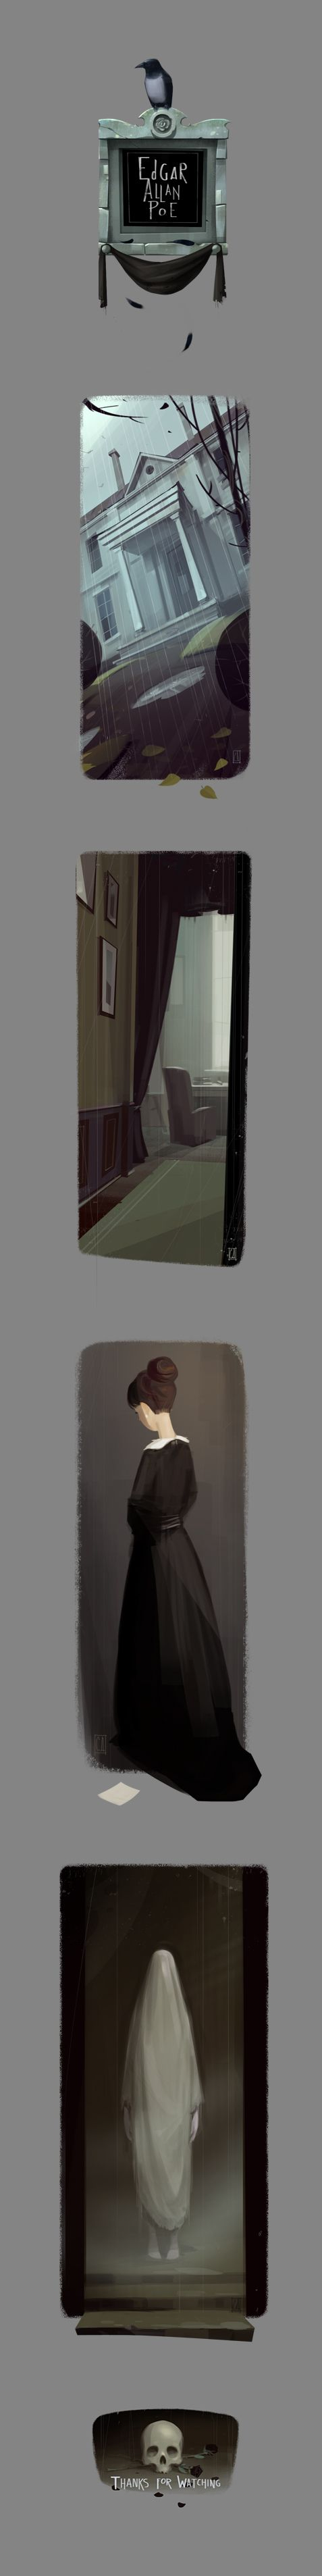 Edgar Allan Poe illustrations by Denis Spichkin, via Behance